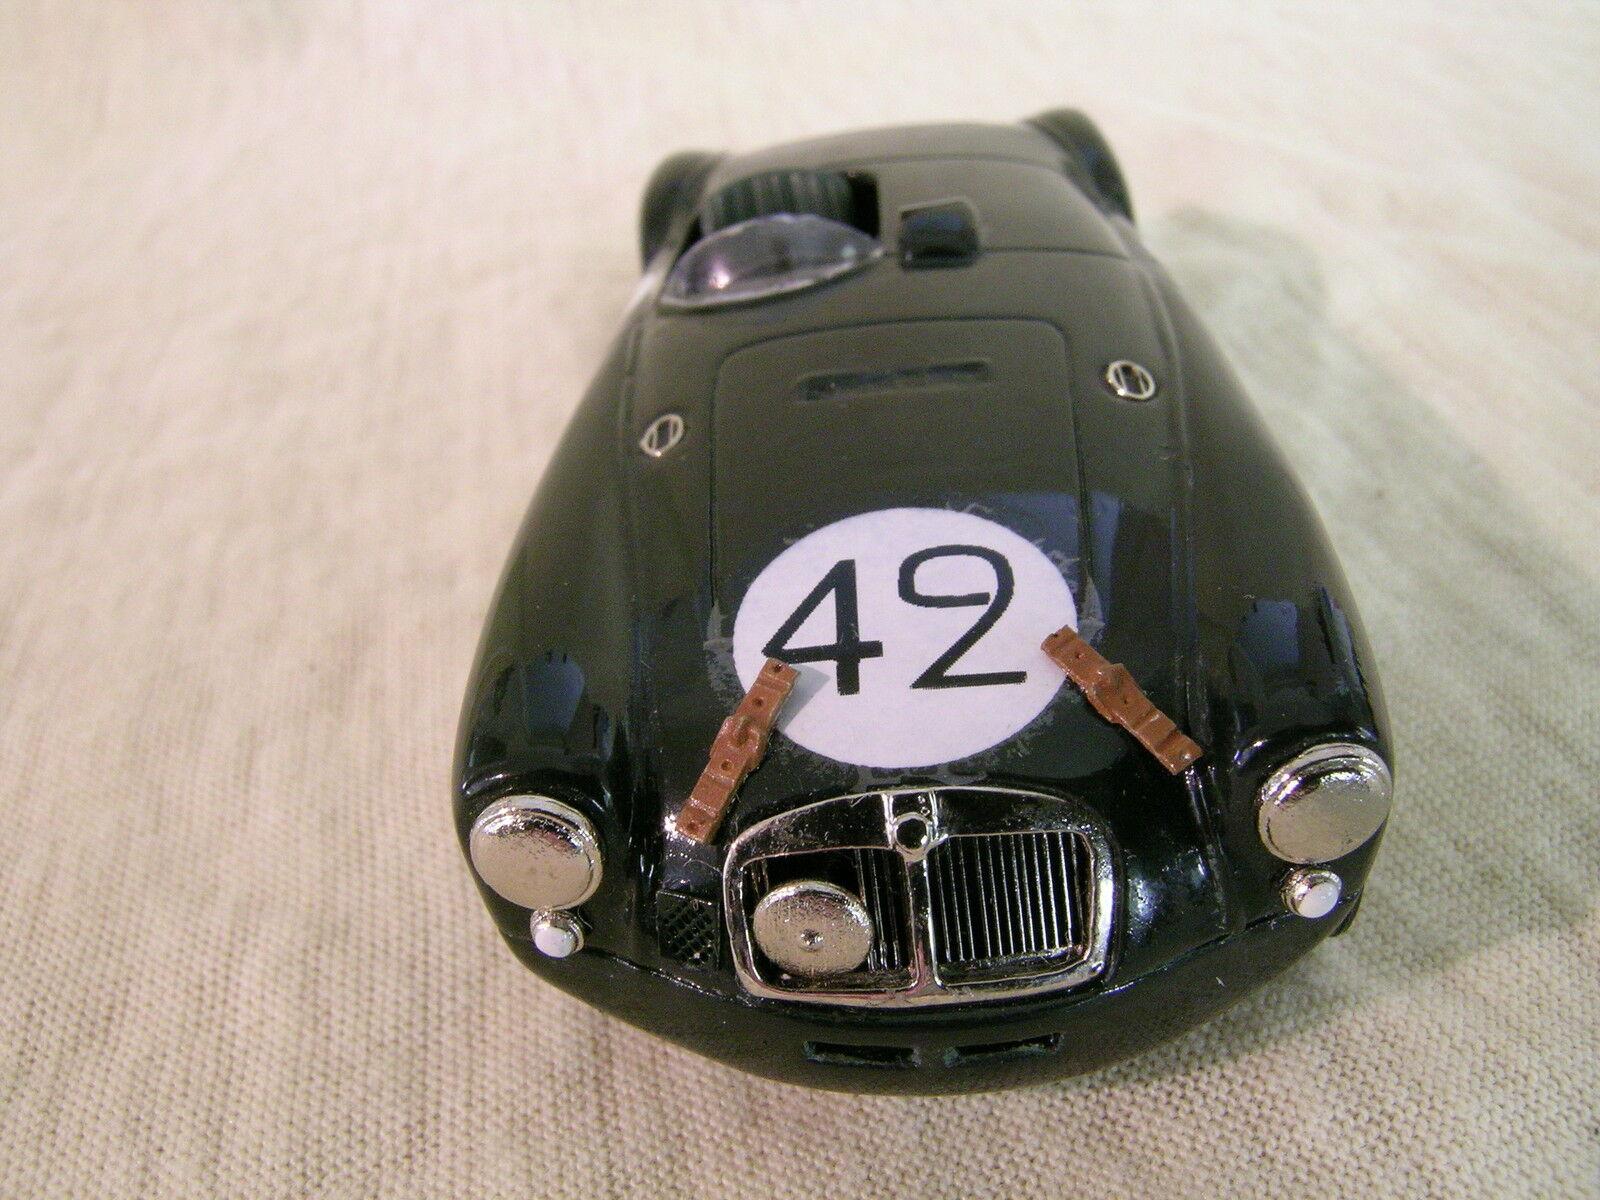 K&R UK MG A A A EX182 LE MANS1955 WORKSTEAM 42 BRG WHITEMETAL HANDBUILT + BOX 1 43 29351d